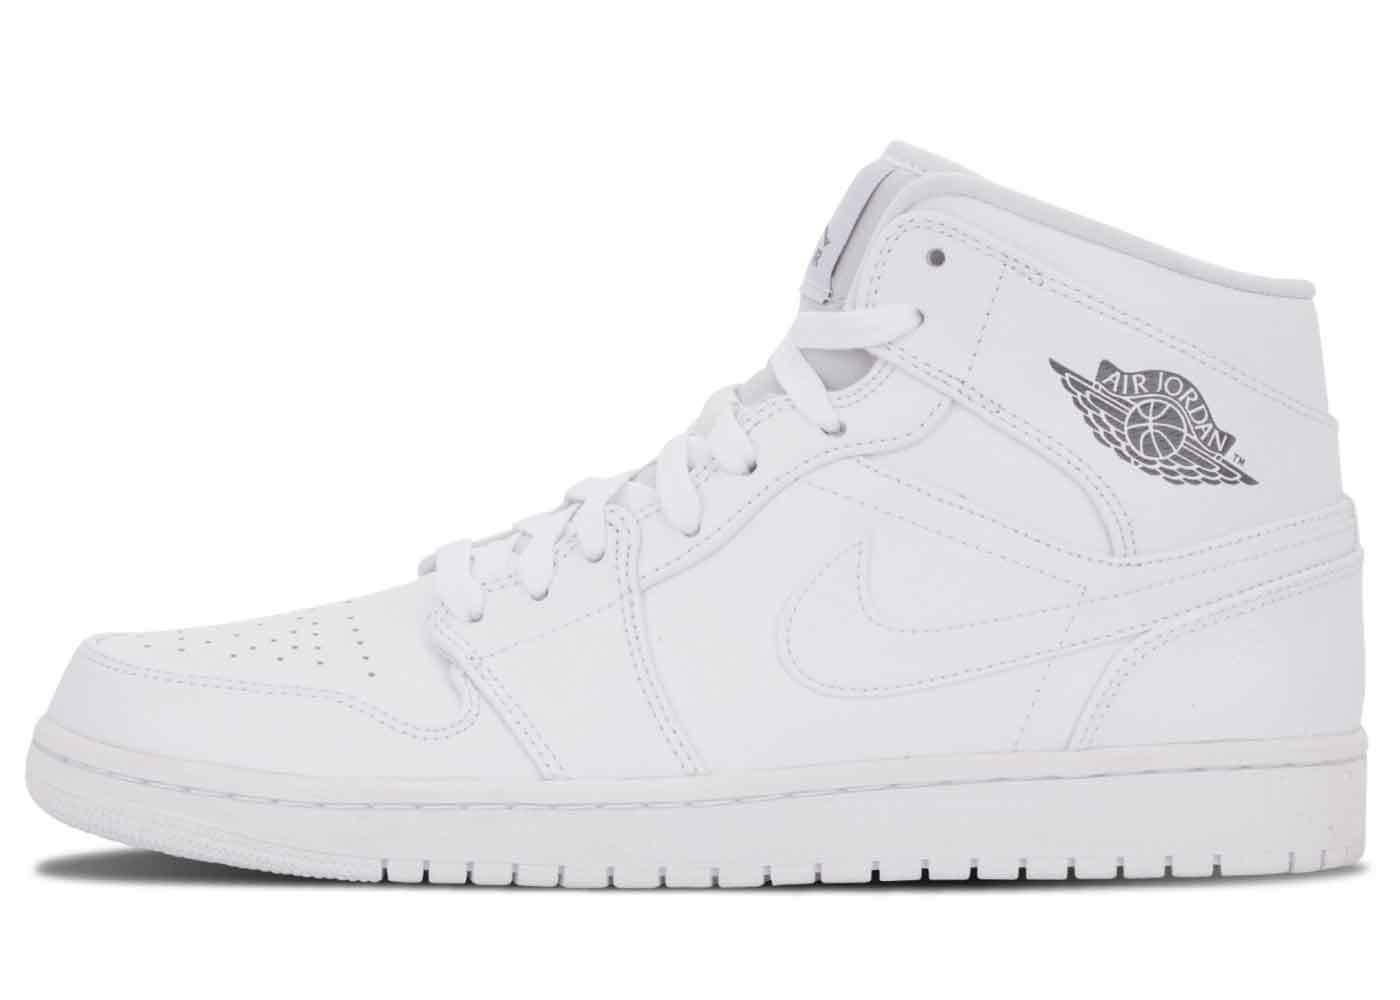 Nike Air Jordan 1 Mid White Cool Grey (2014)の写真